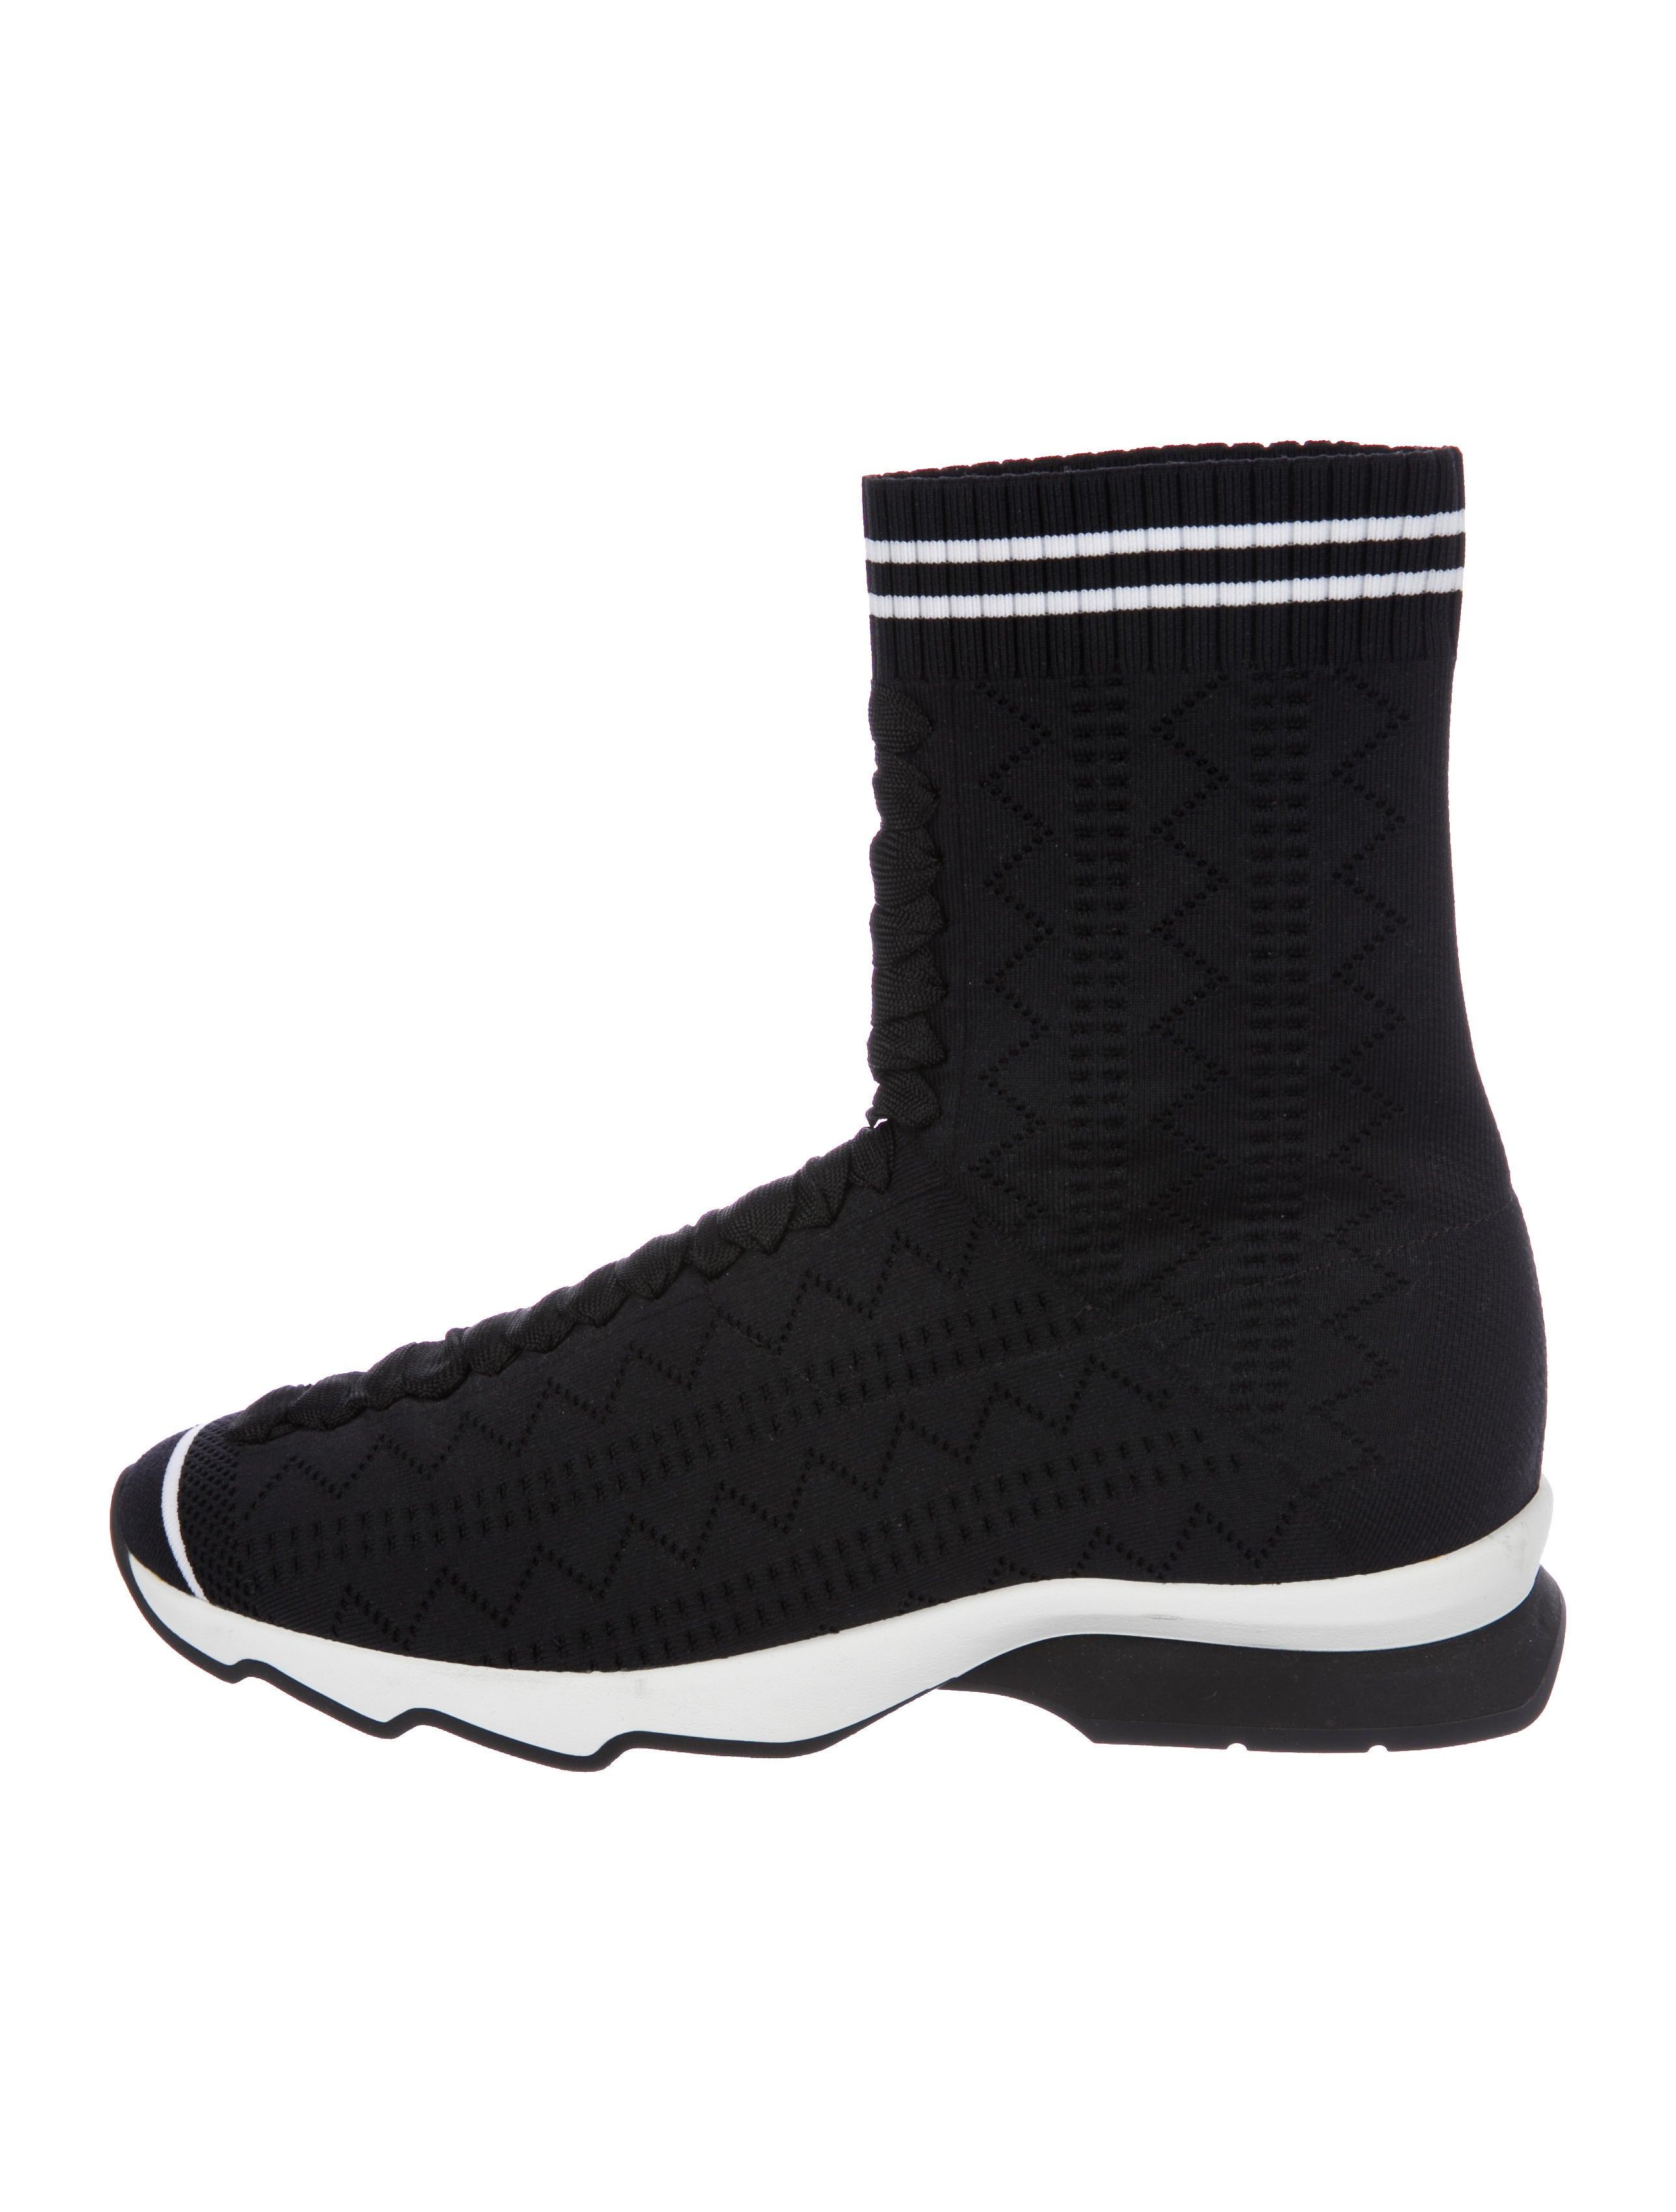 Fendi 2018 Zig-Zag Knit Sock Sneakers wiki discount clearance shop online discount visit G6EGn